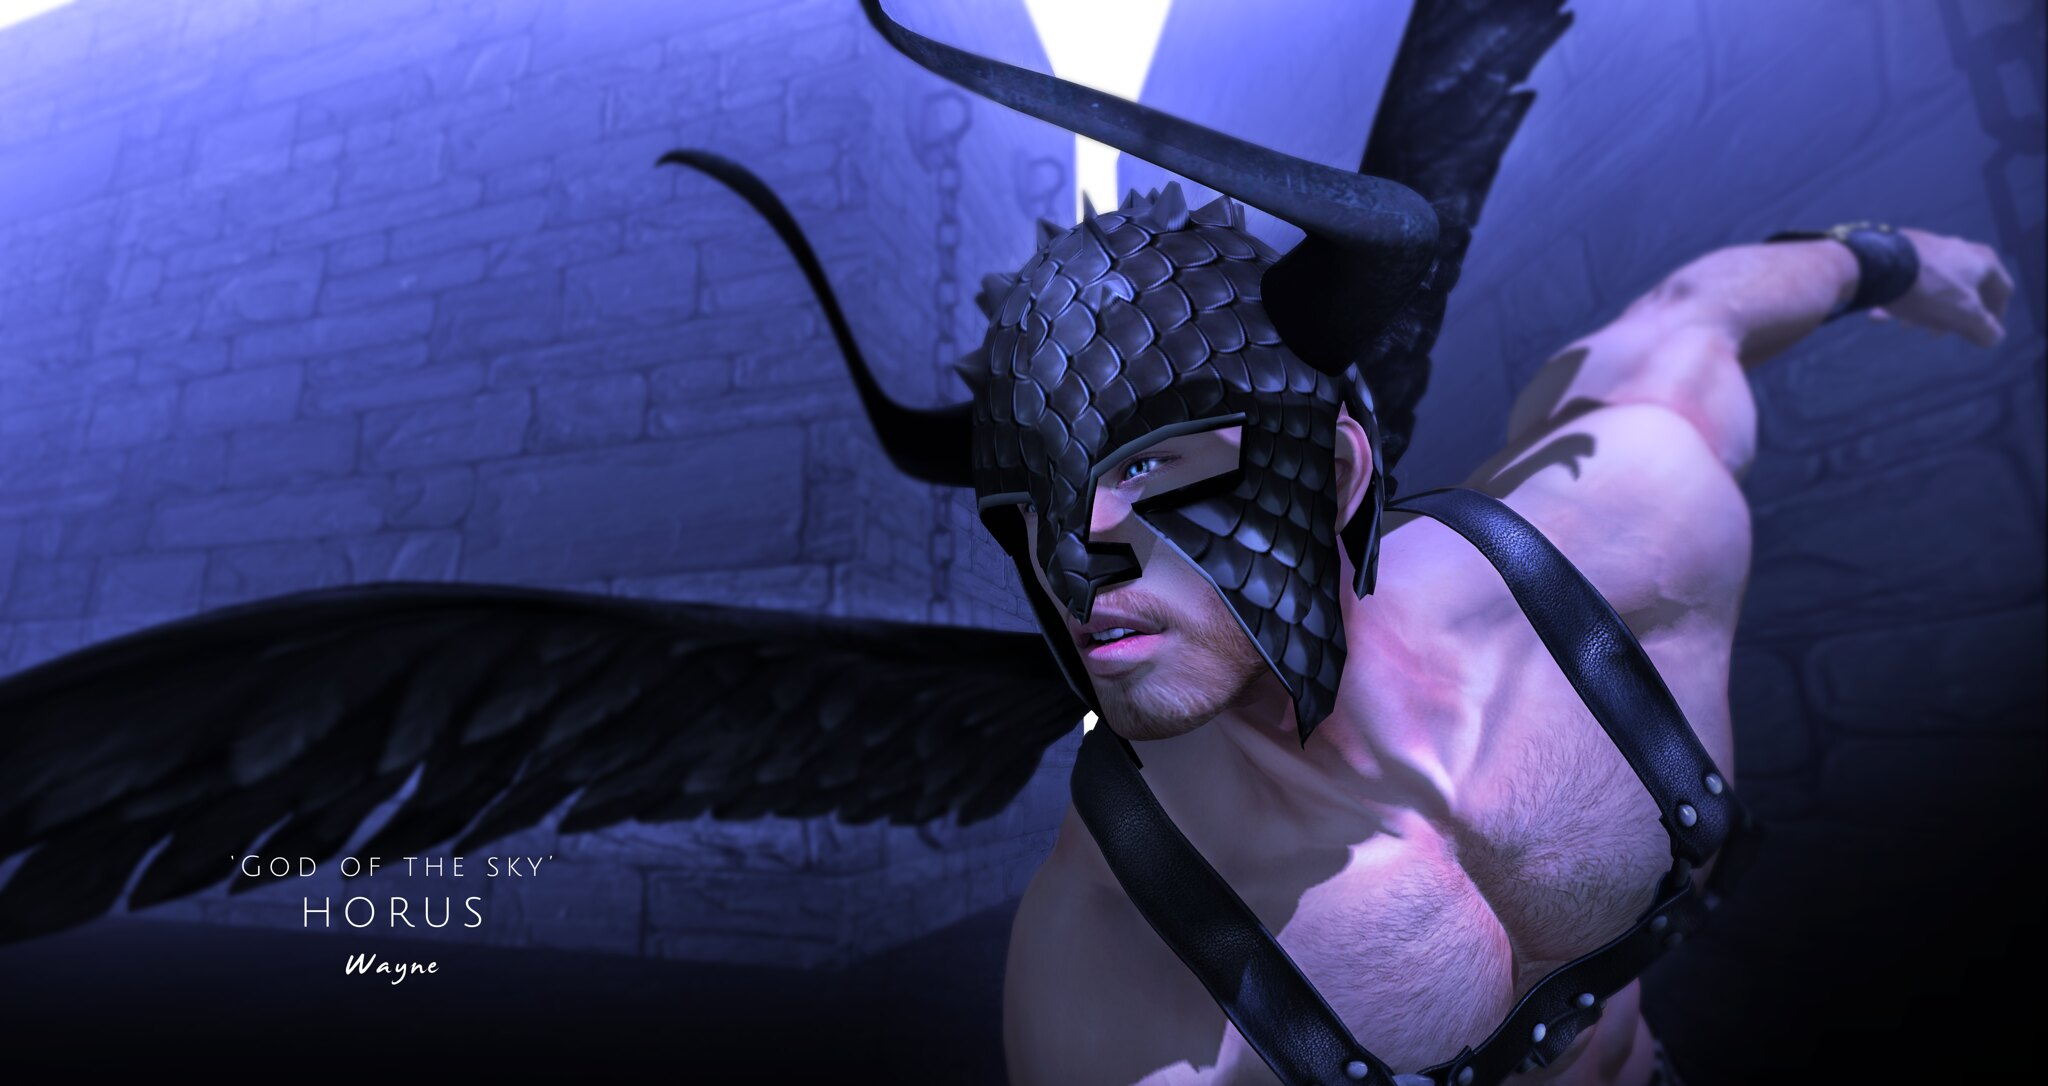 Horus - 'God of the sky'